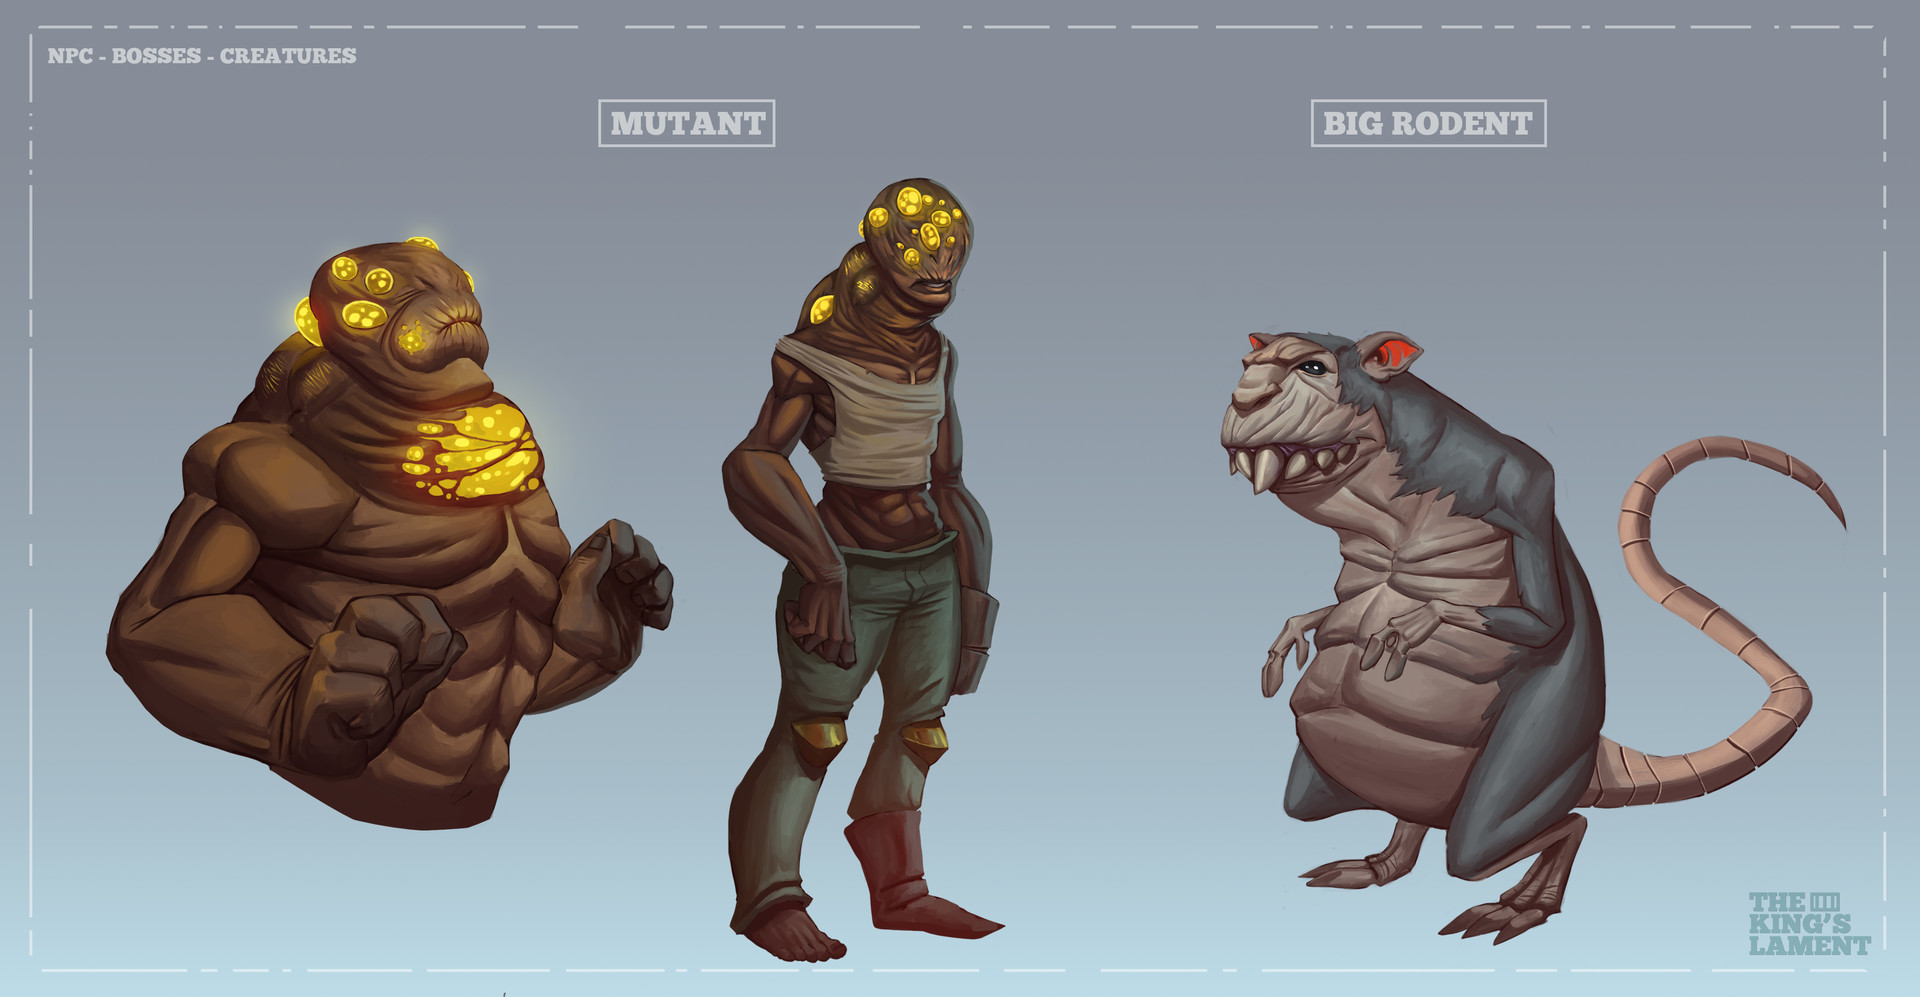 NPC - BOSSES - CREATURES